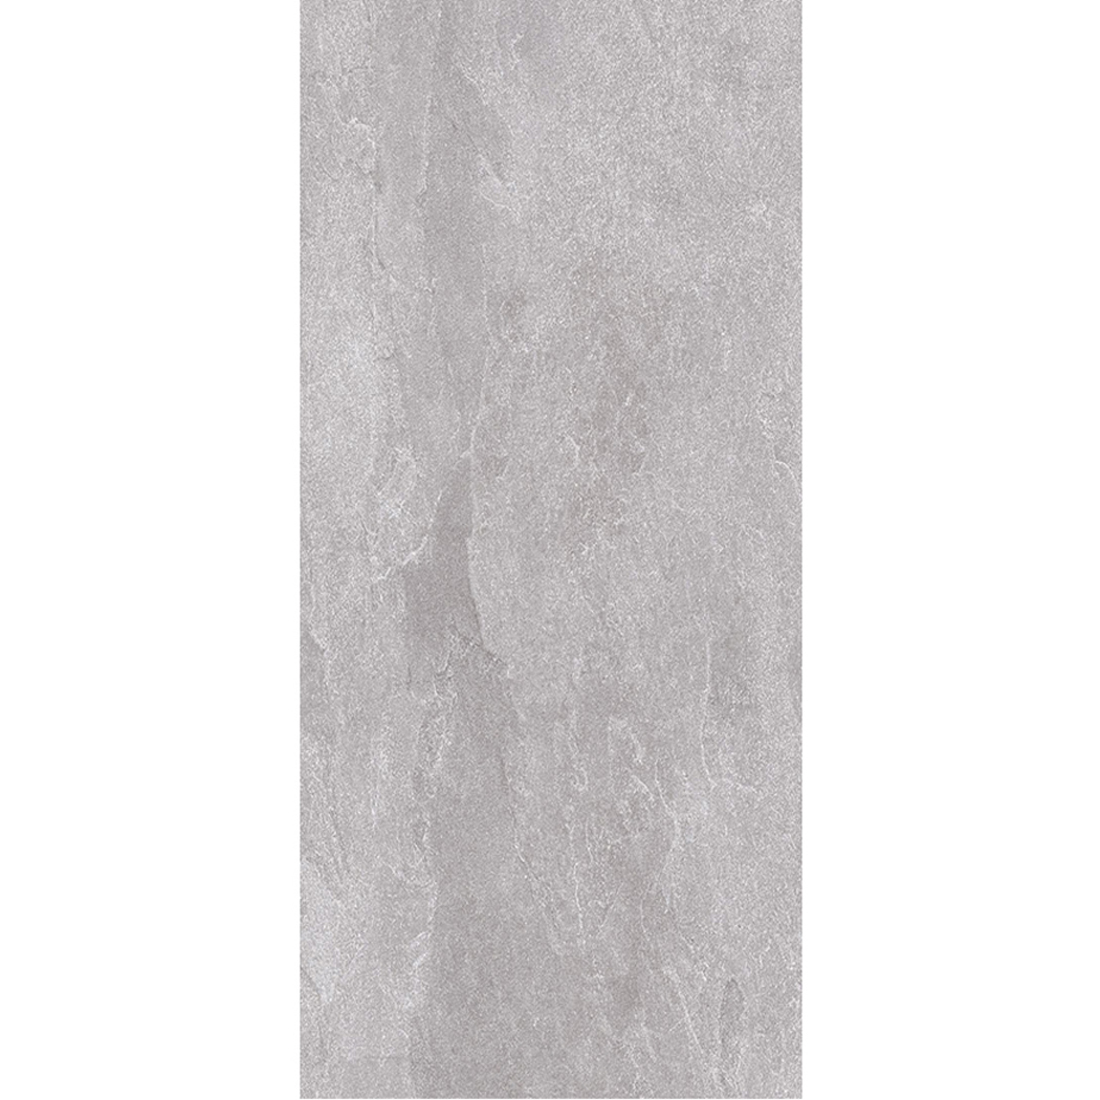 Nitco Nordic Fossil N6903 Matte Glazed Vitrified Tile